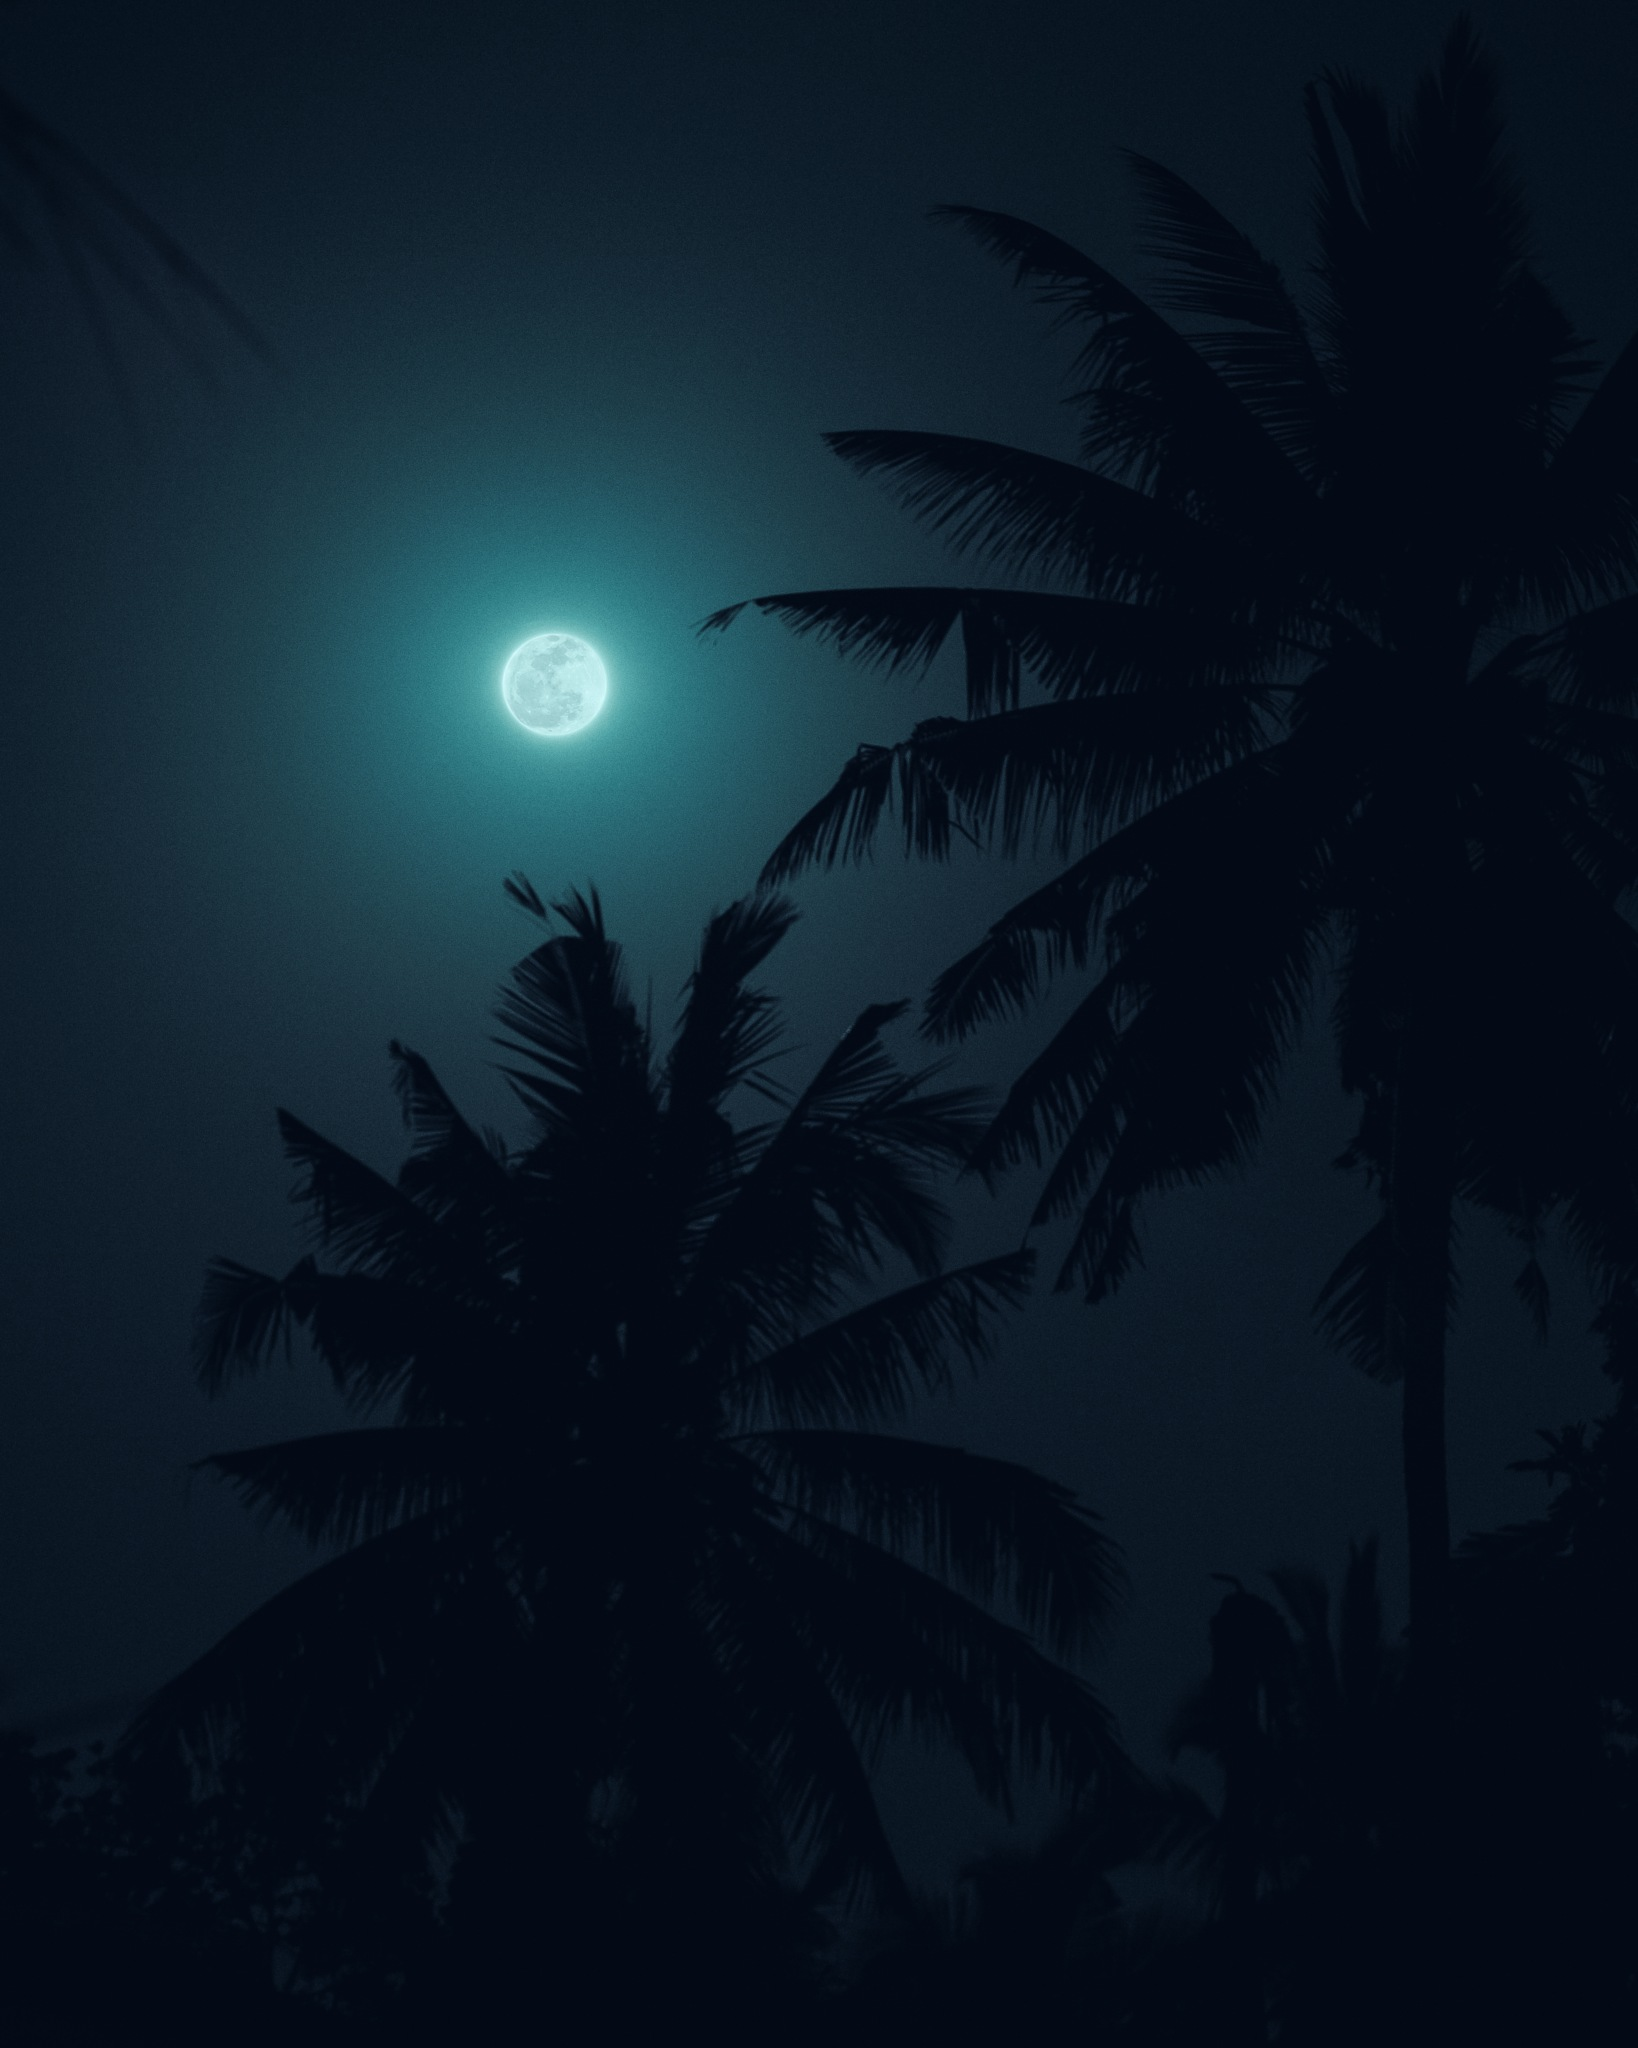 Full Moon by Oleksii Boiko